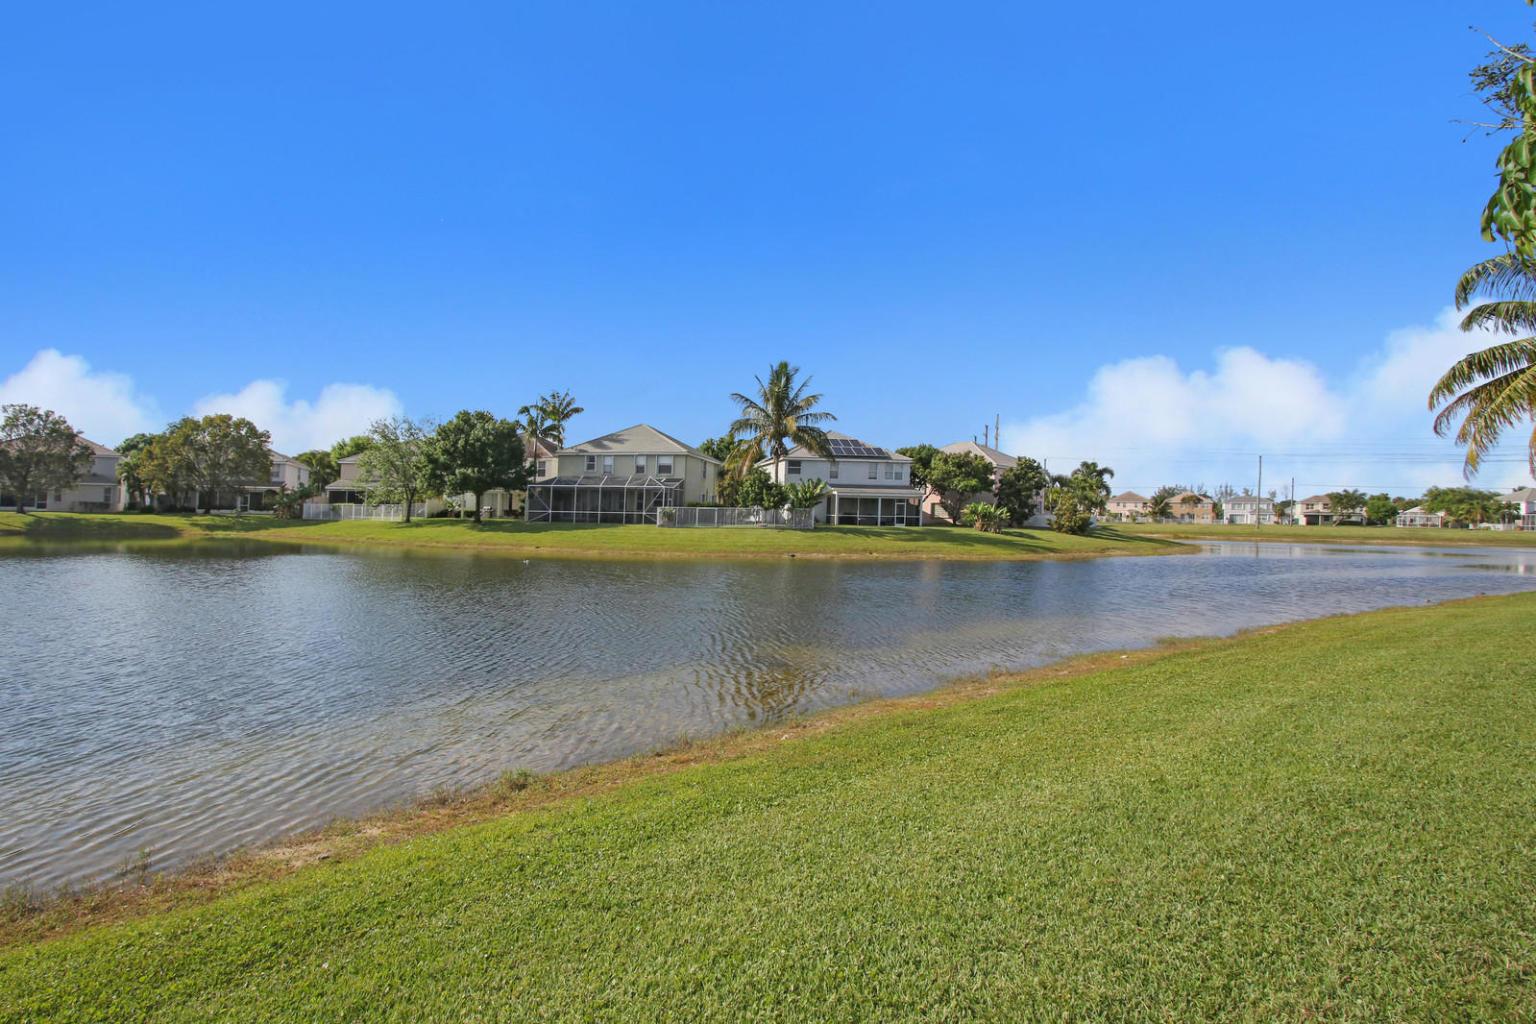 Photo of 133 Kensington Way, Royal Palm Beach, FL 33414